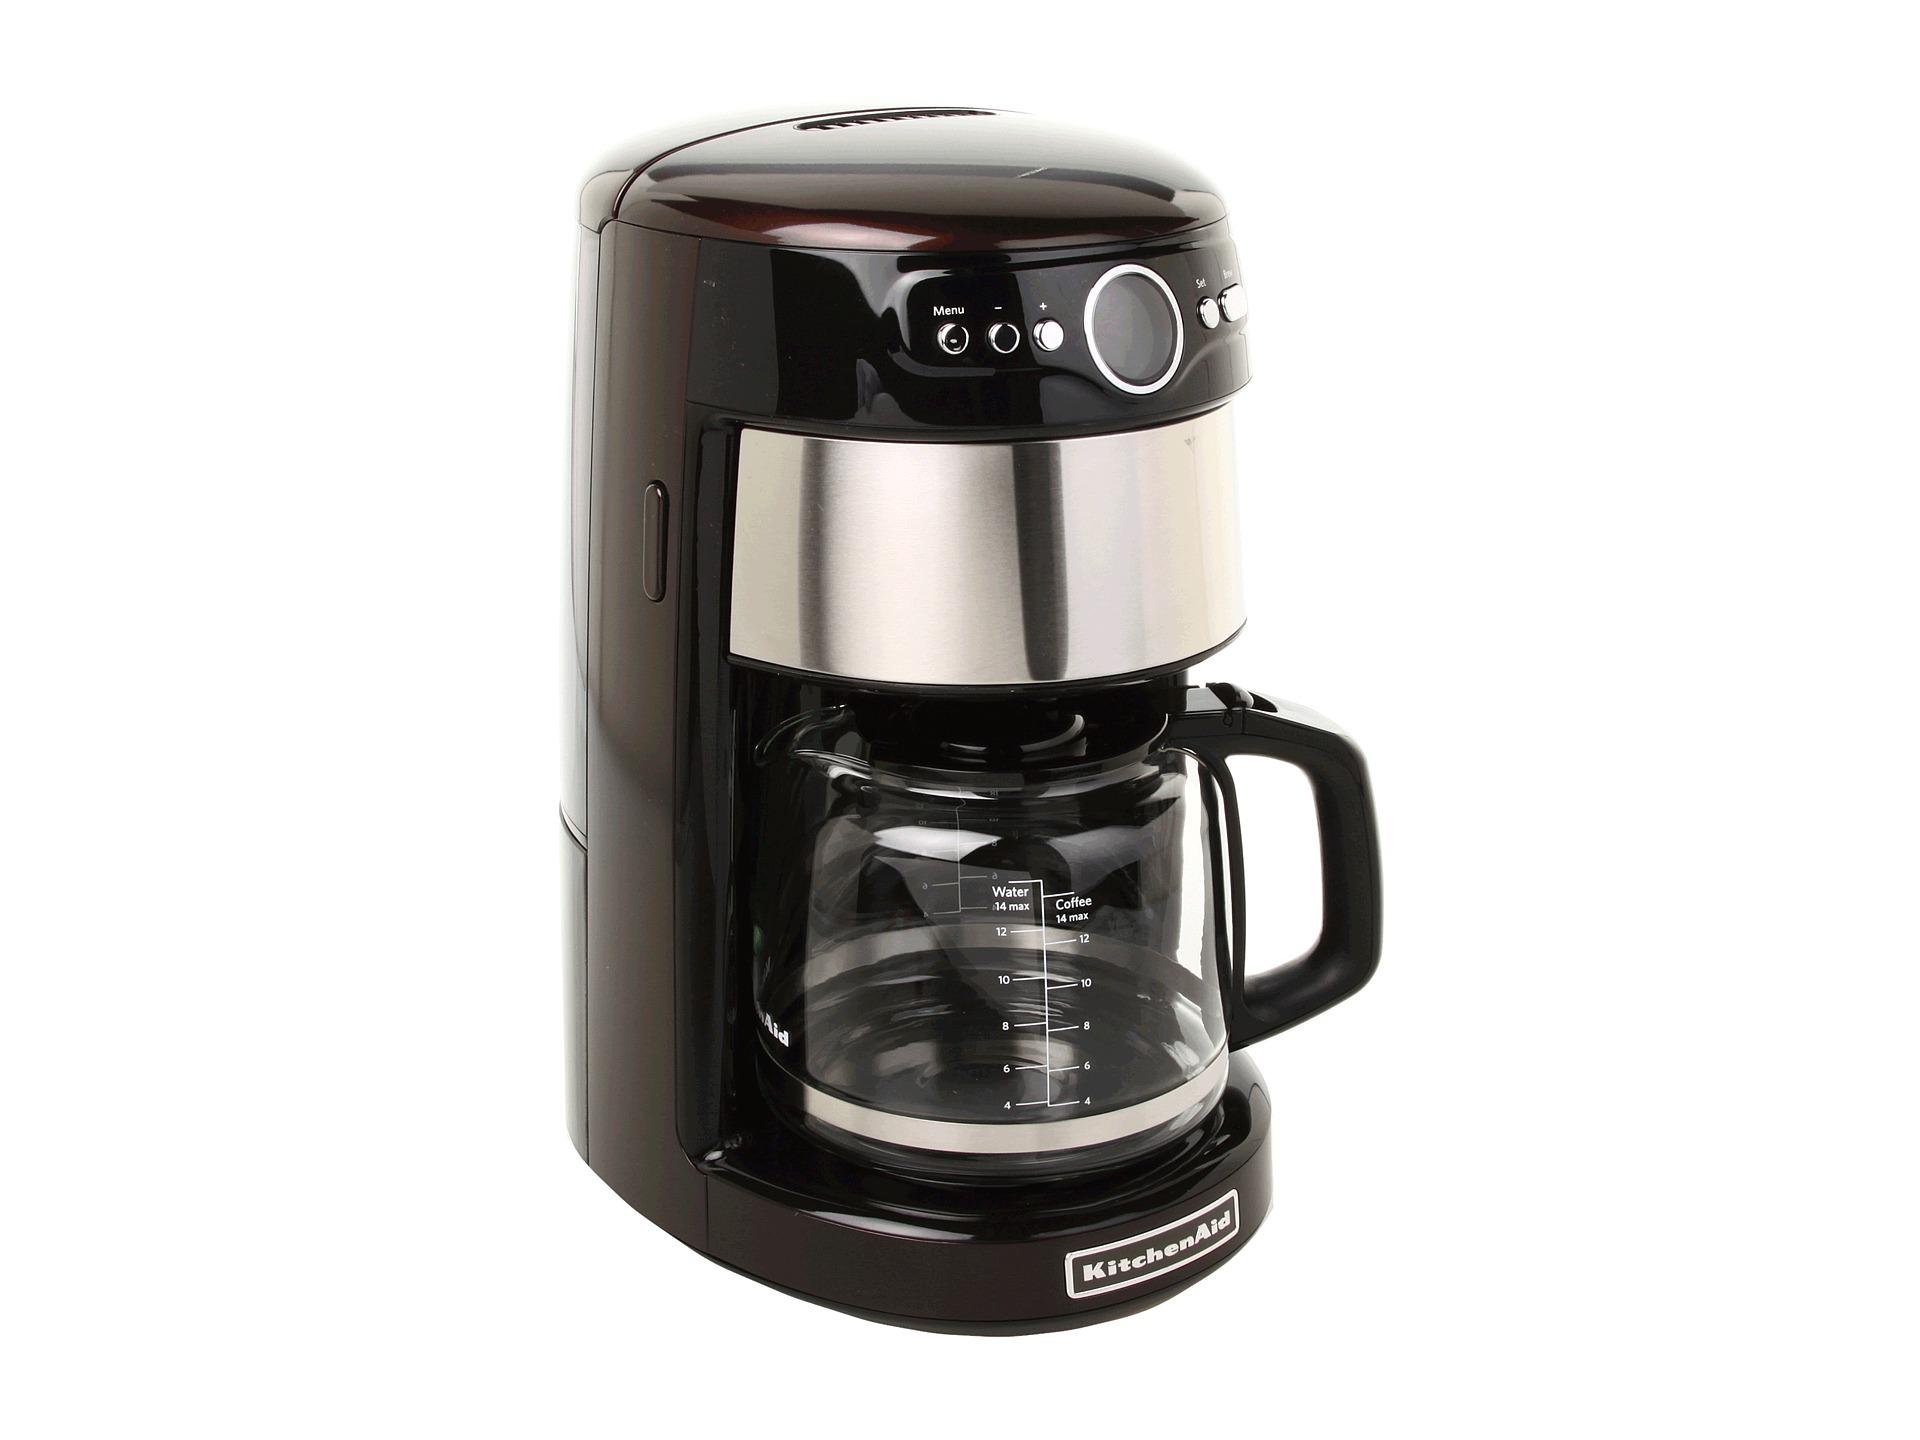 Kitchenaid Coffee Maker 14 Cup Manual : Kitchenaid: Kitchenaid 14 Cup Coffee Maker